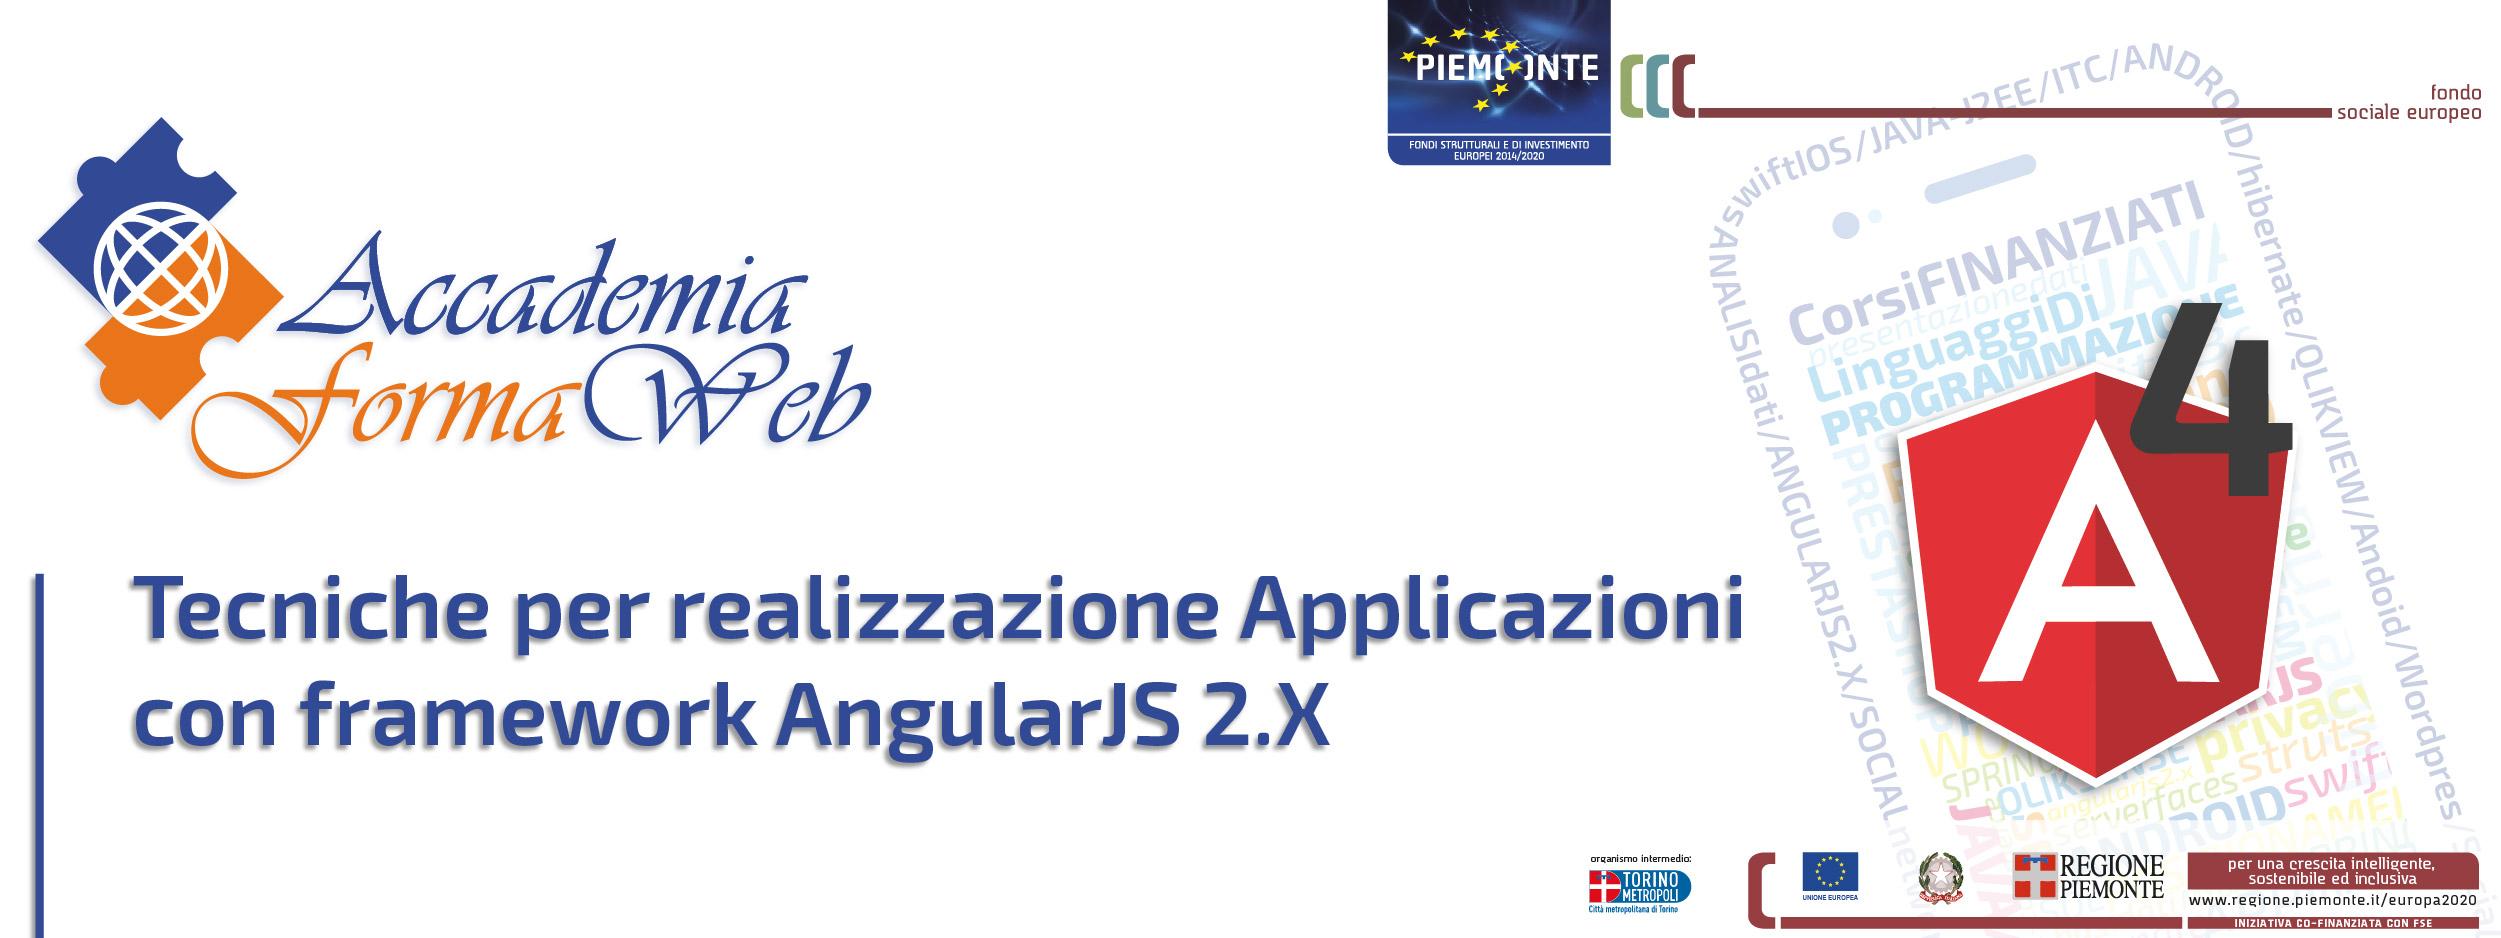 corso_finanziato_angular-2x